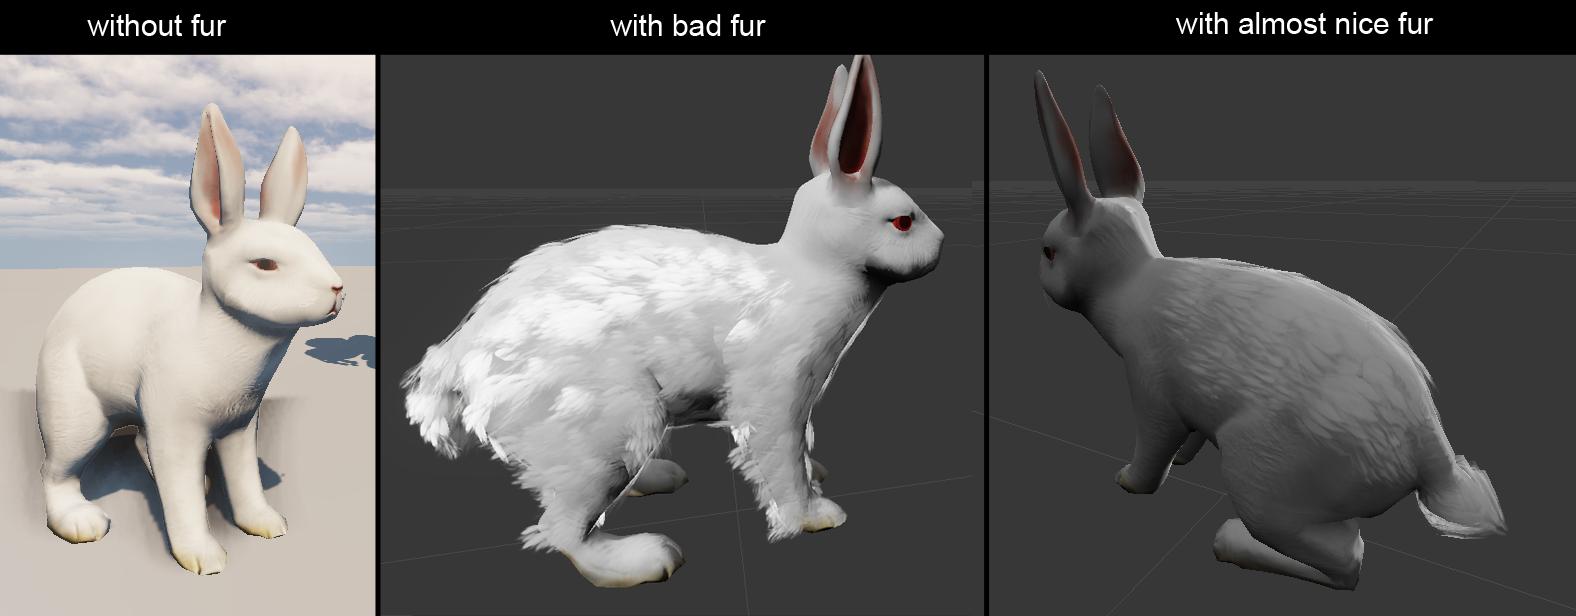 Rabbit Character Update news - Mod DB